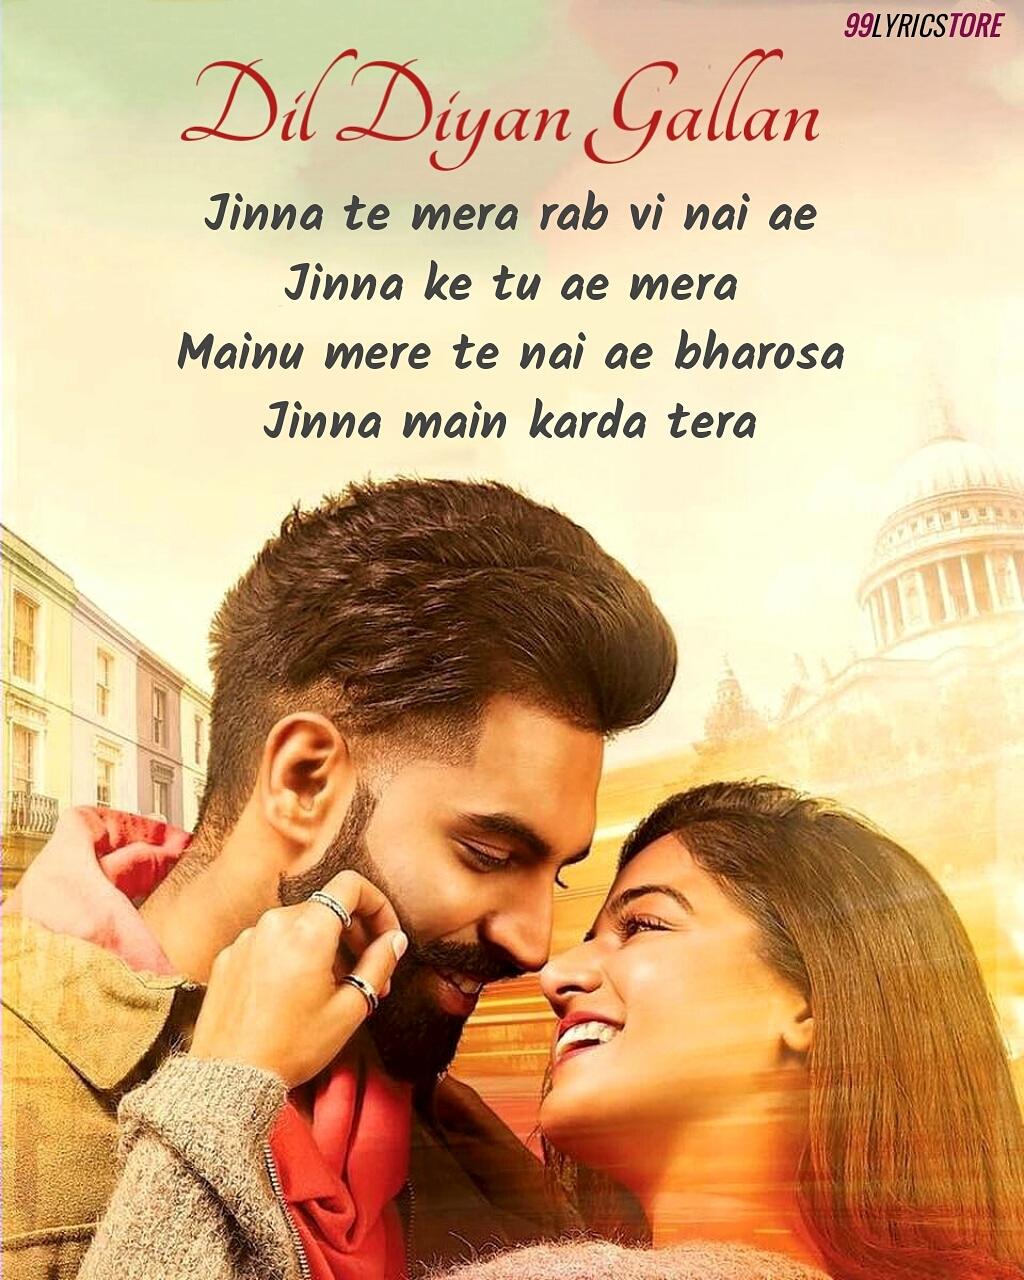 Dil Diyan Gallan Punjabi Song Lyrics Sung by Abhijeet Srivastava